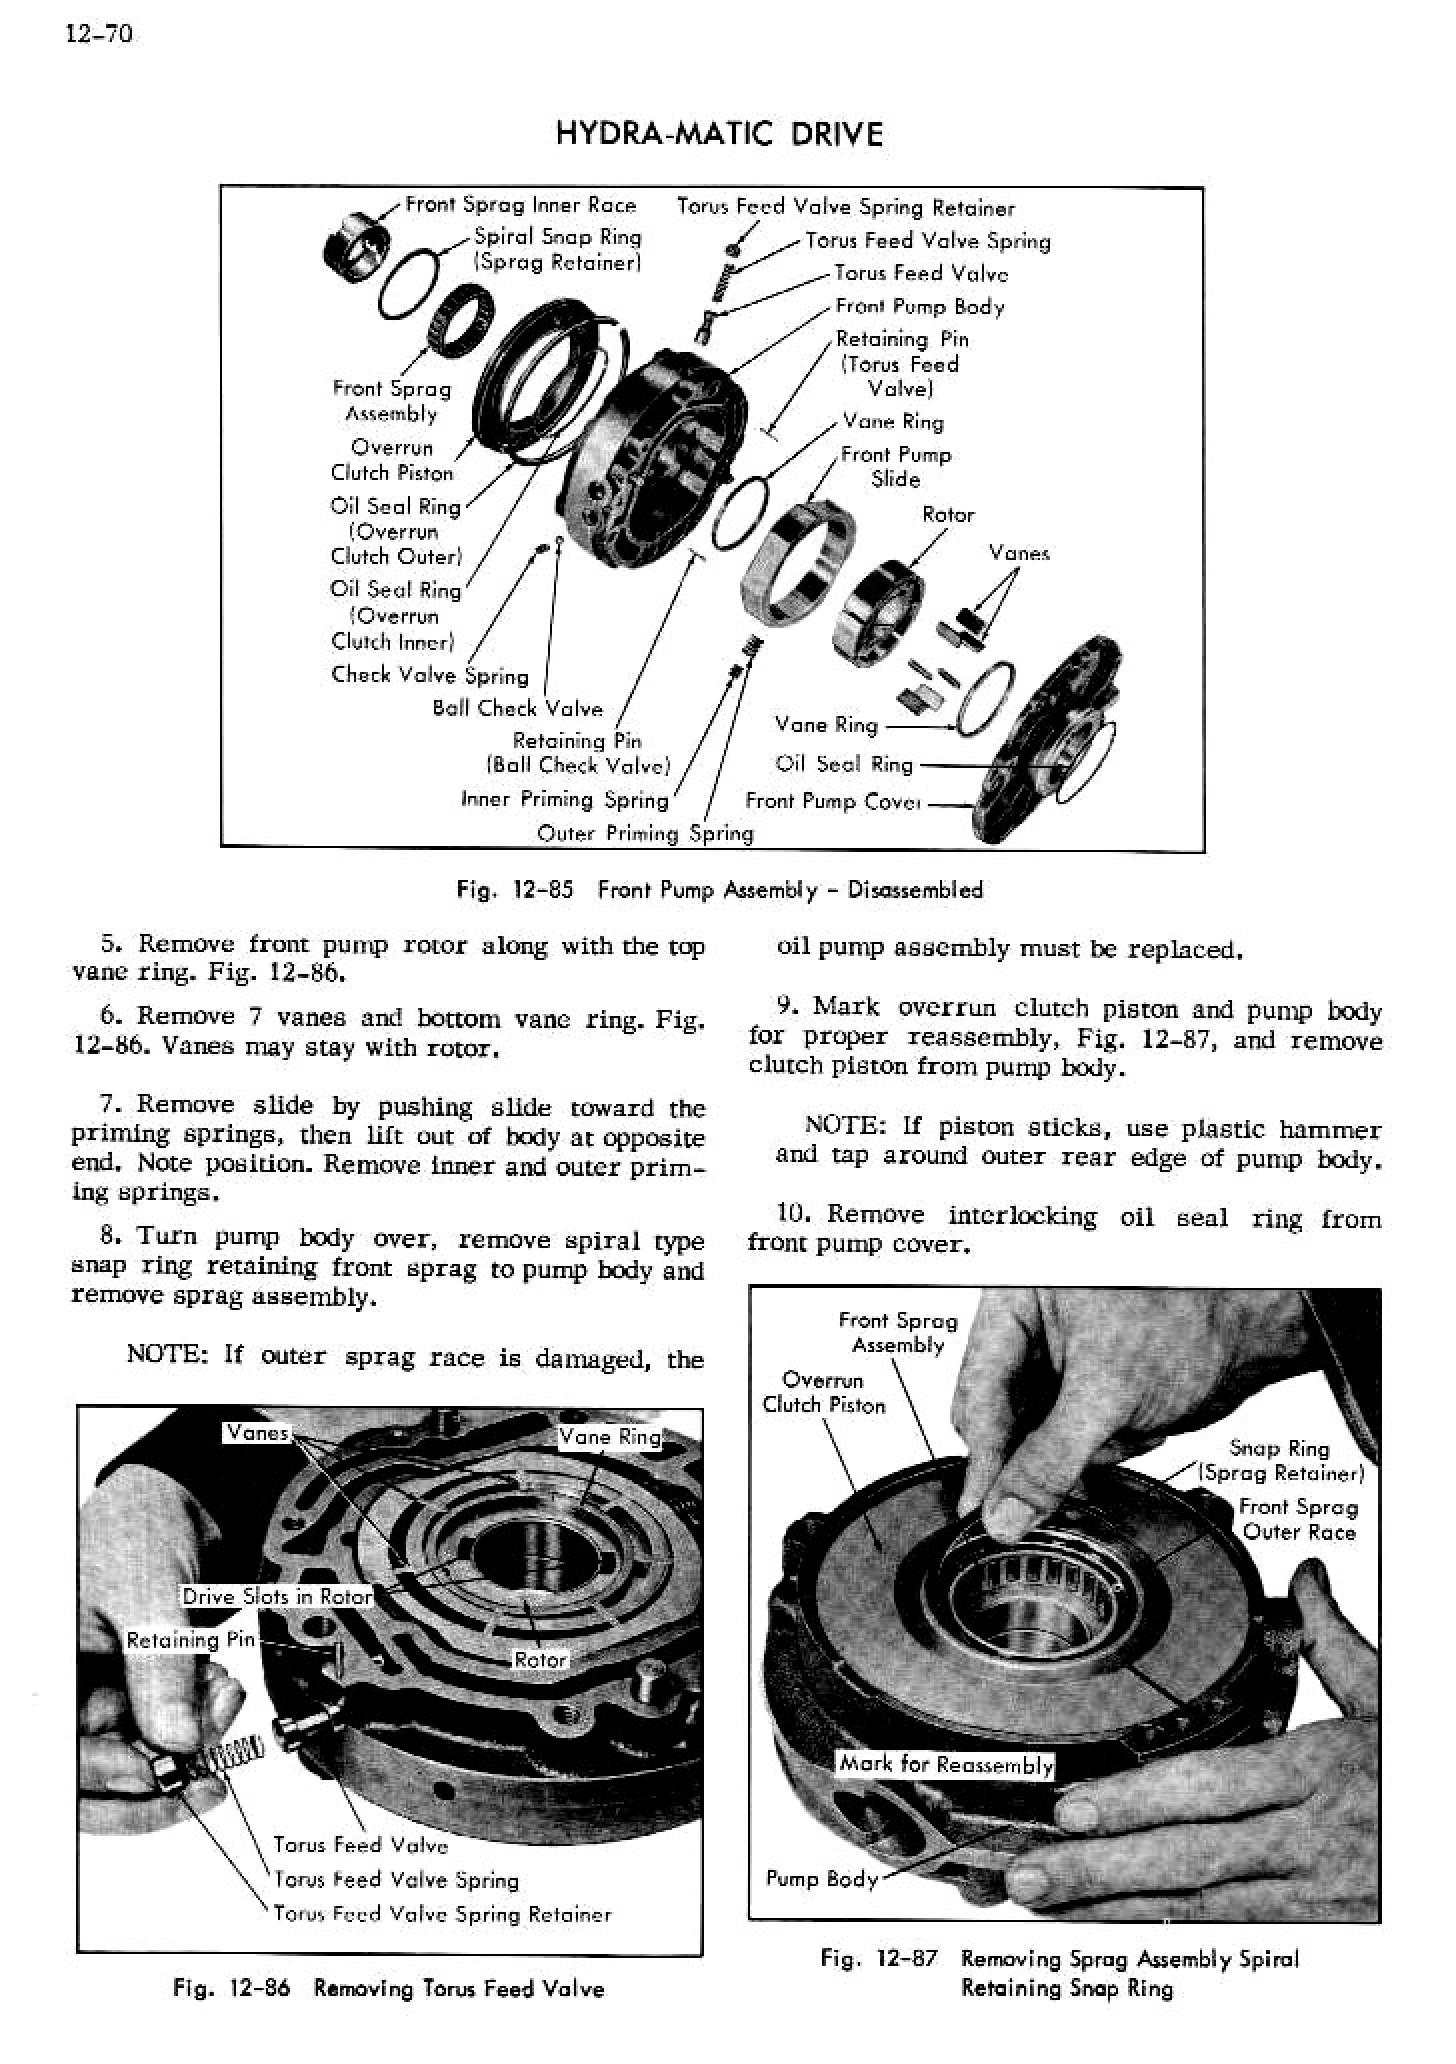 1956 Cadillac Shop Manual- Hydra-Matic Page 70 of 94